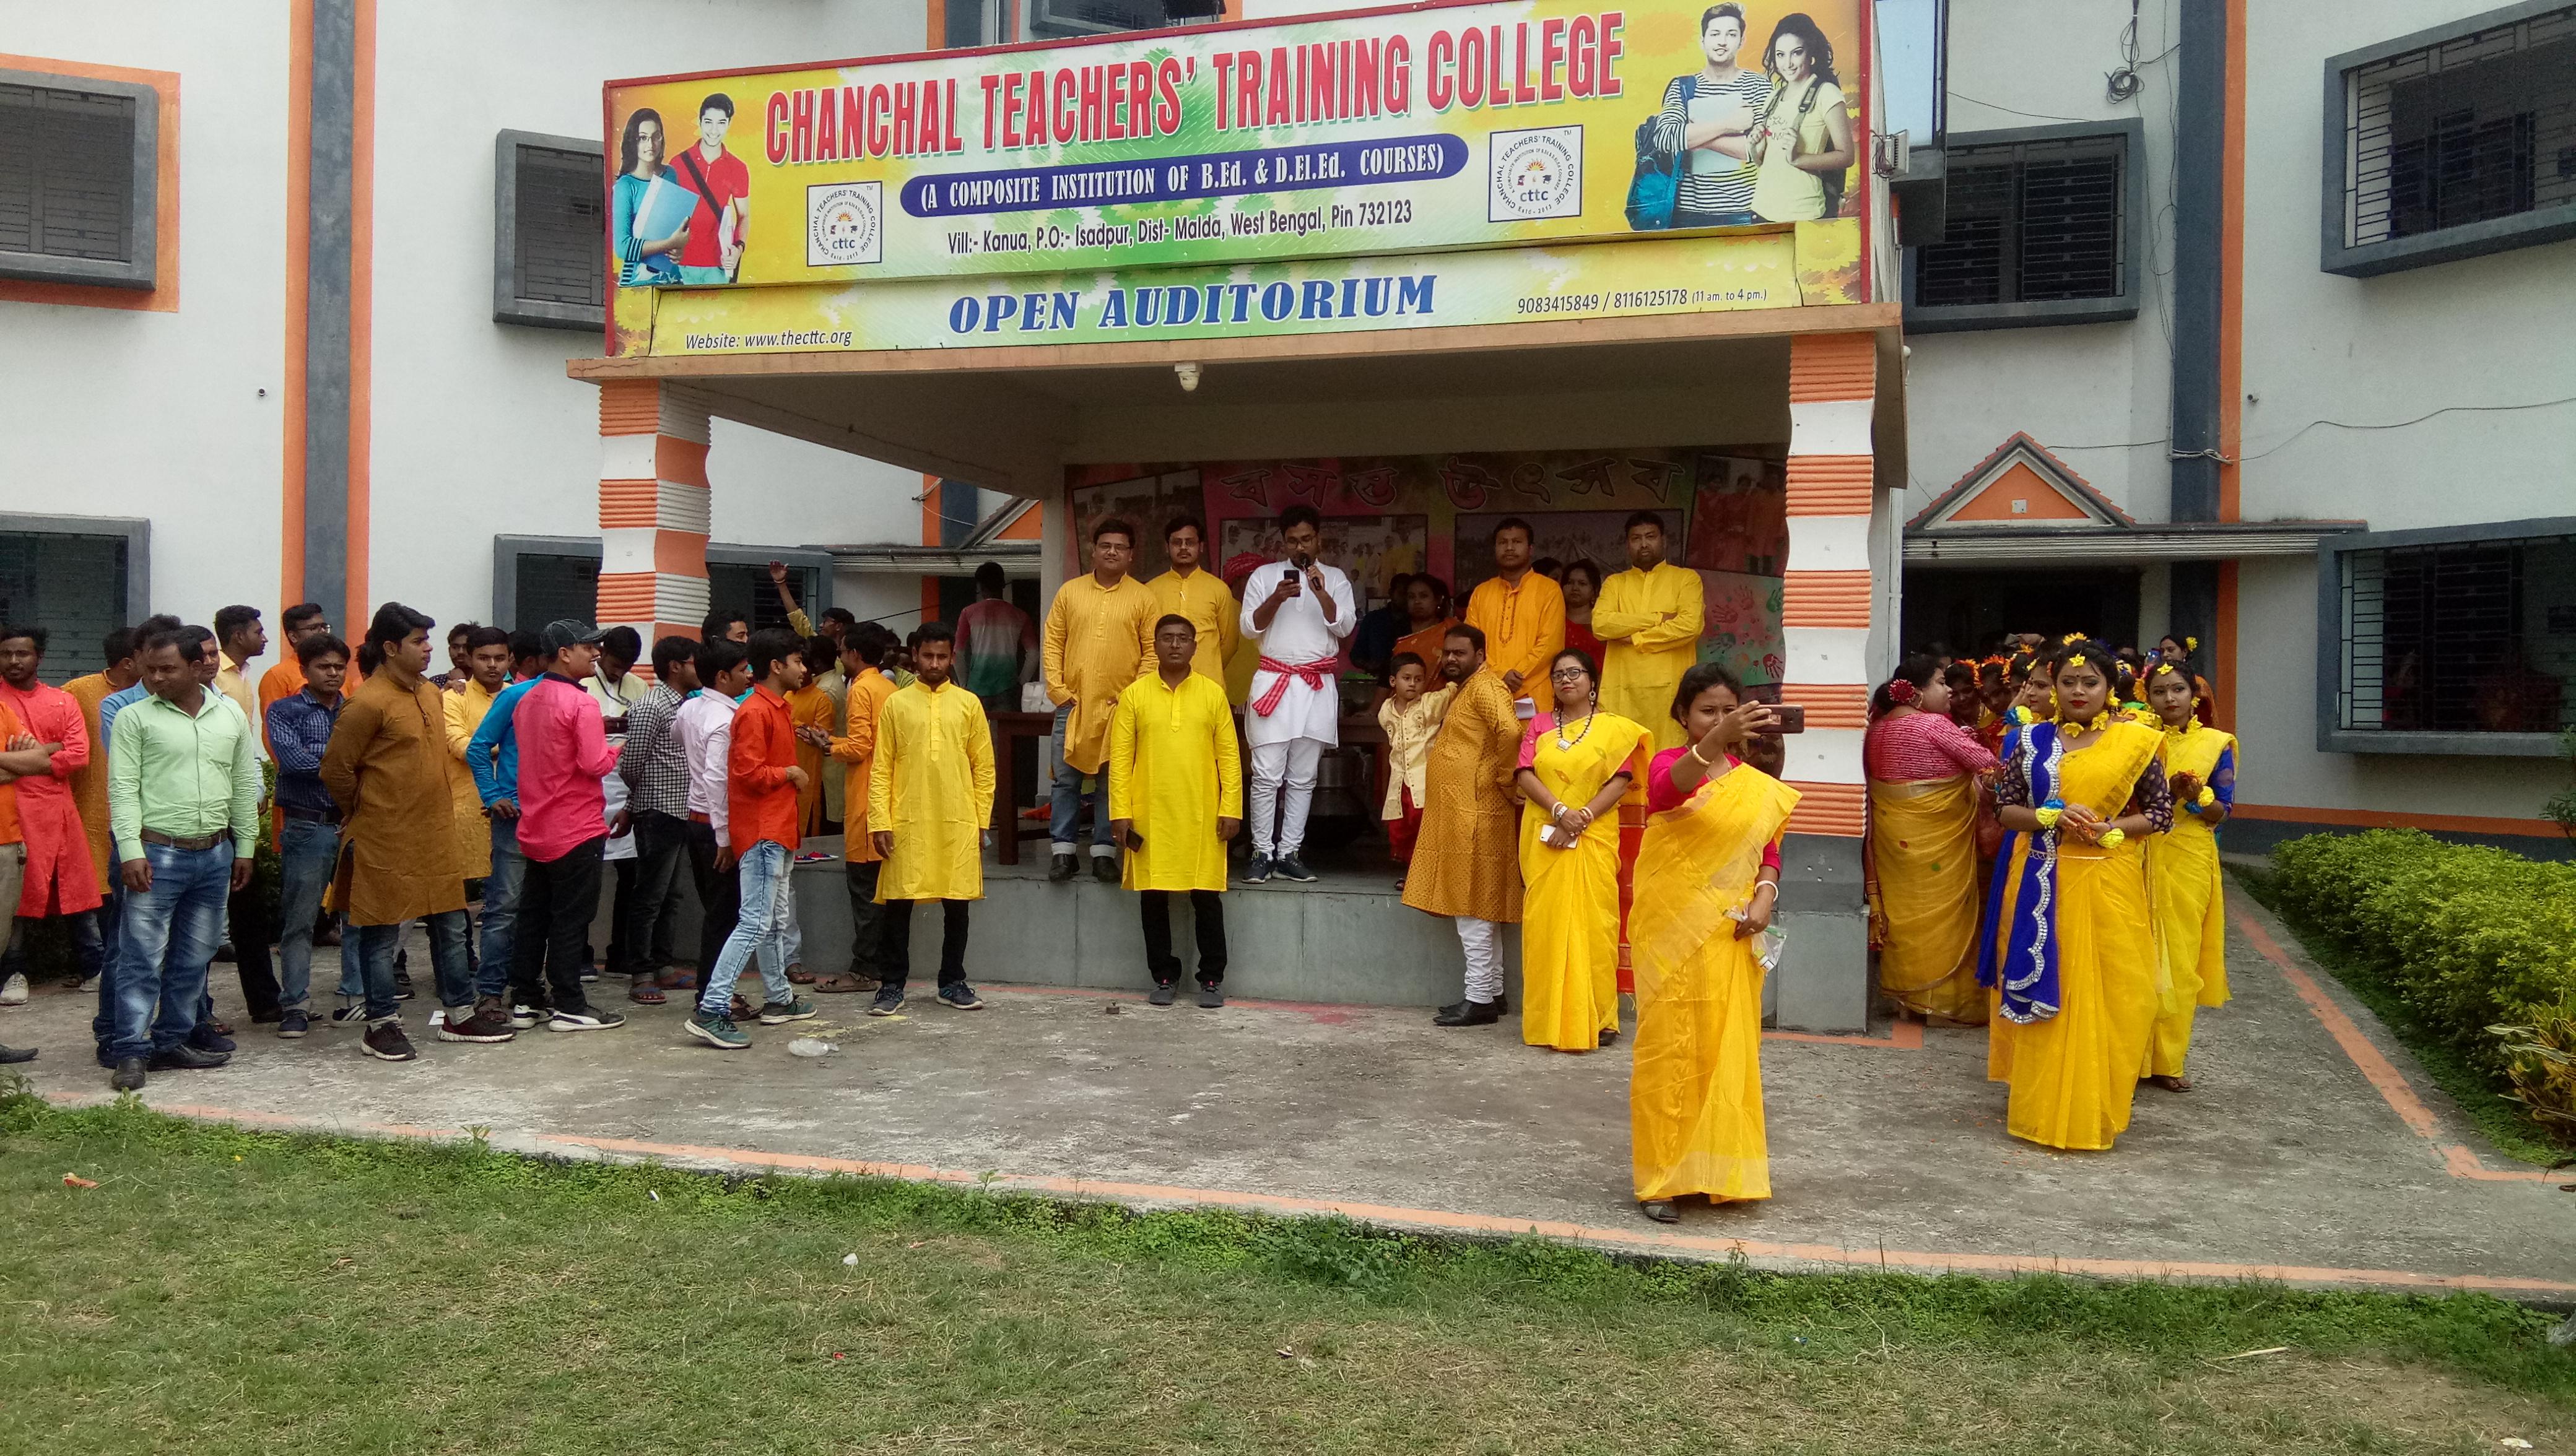 Teachers Training College Malda.jpg